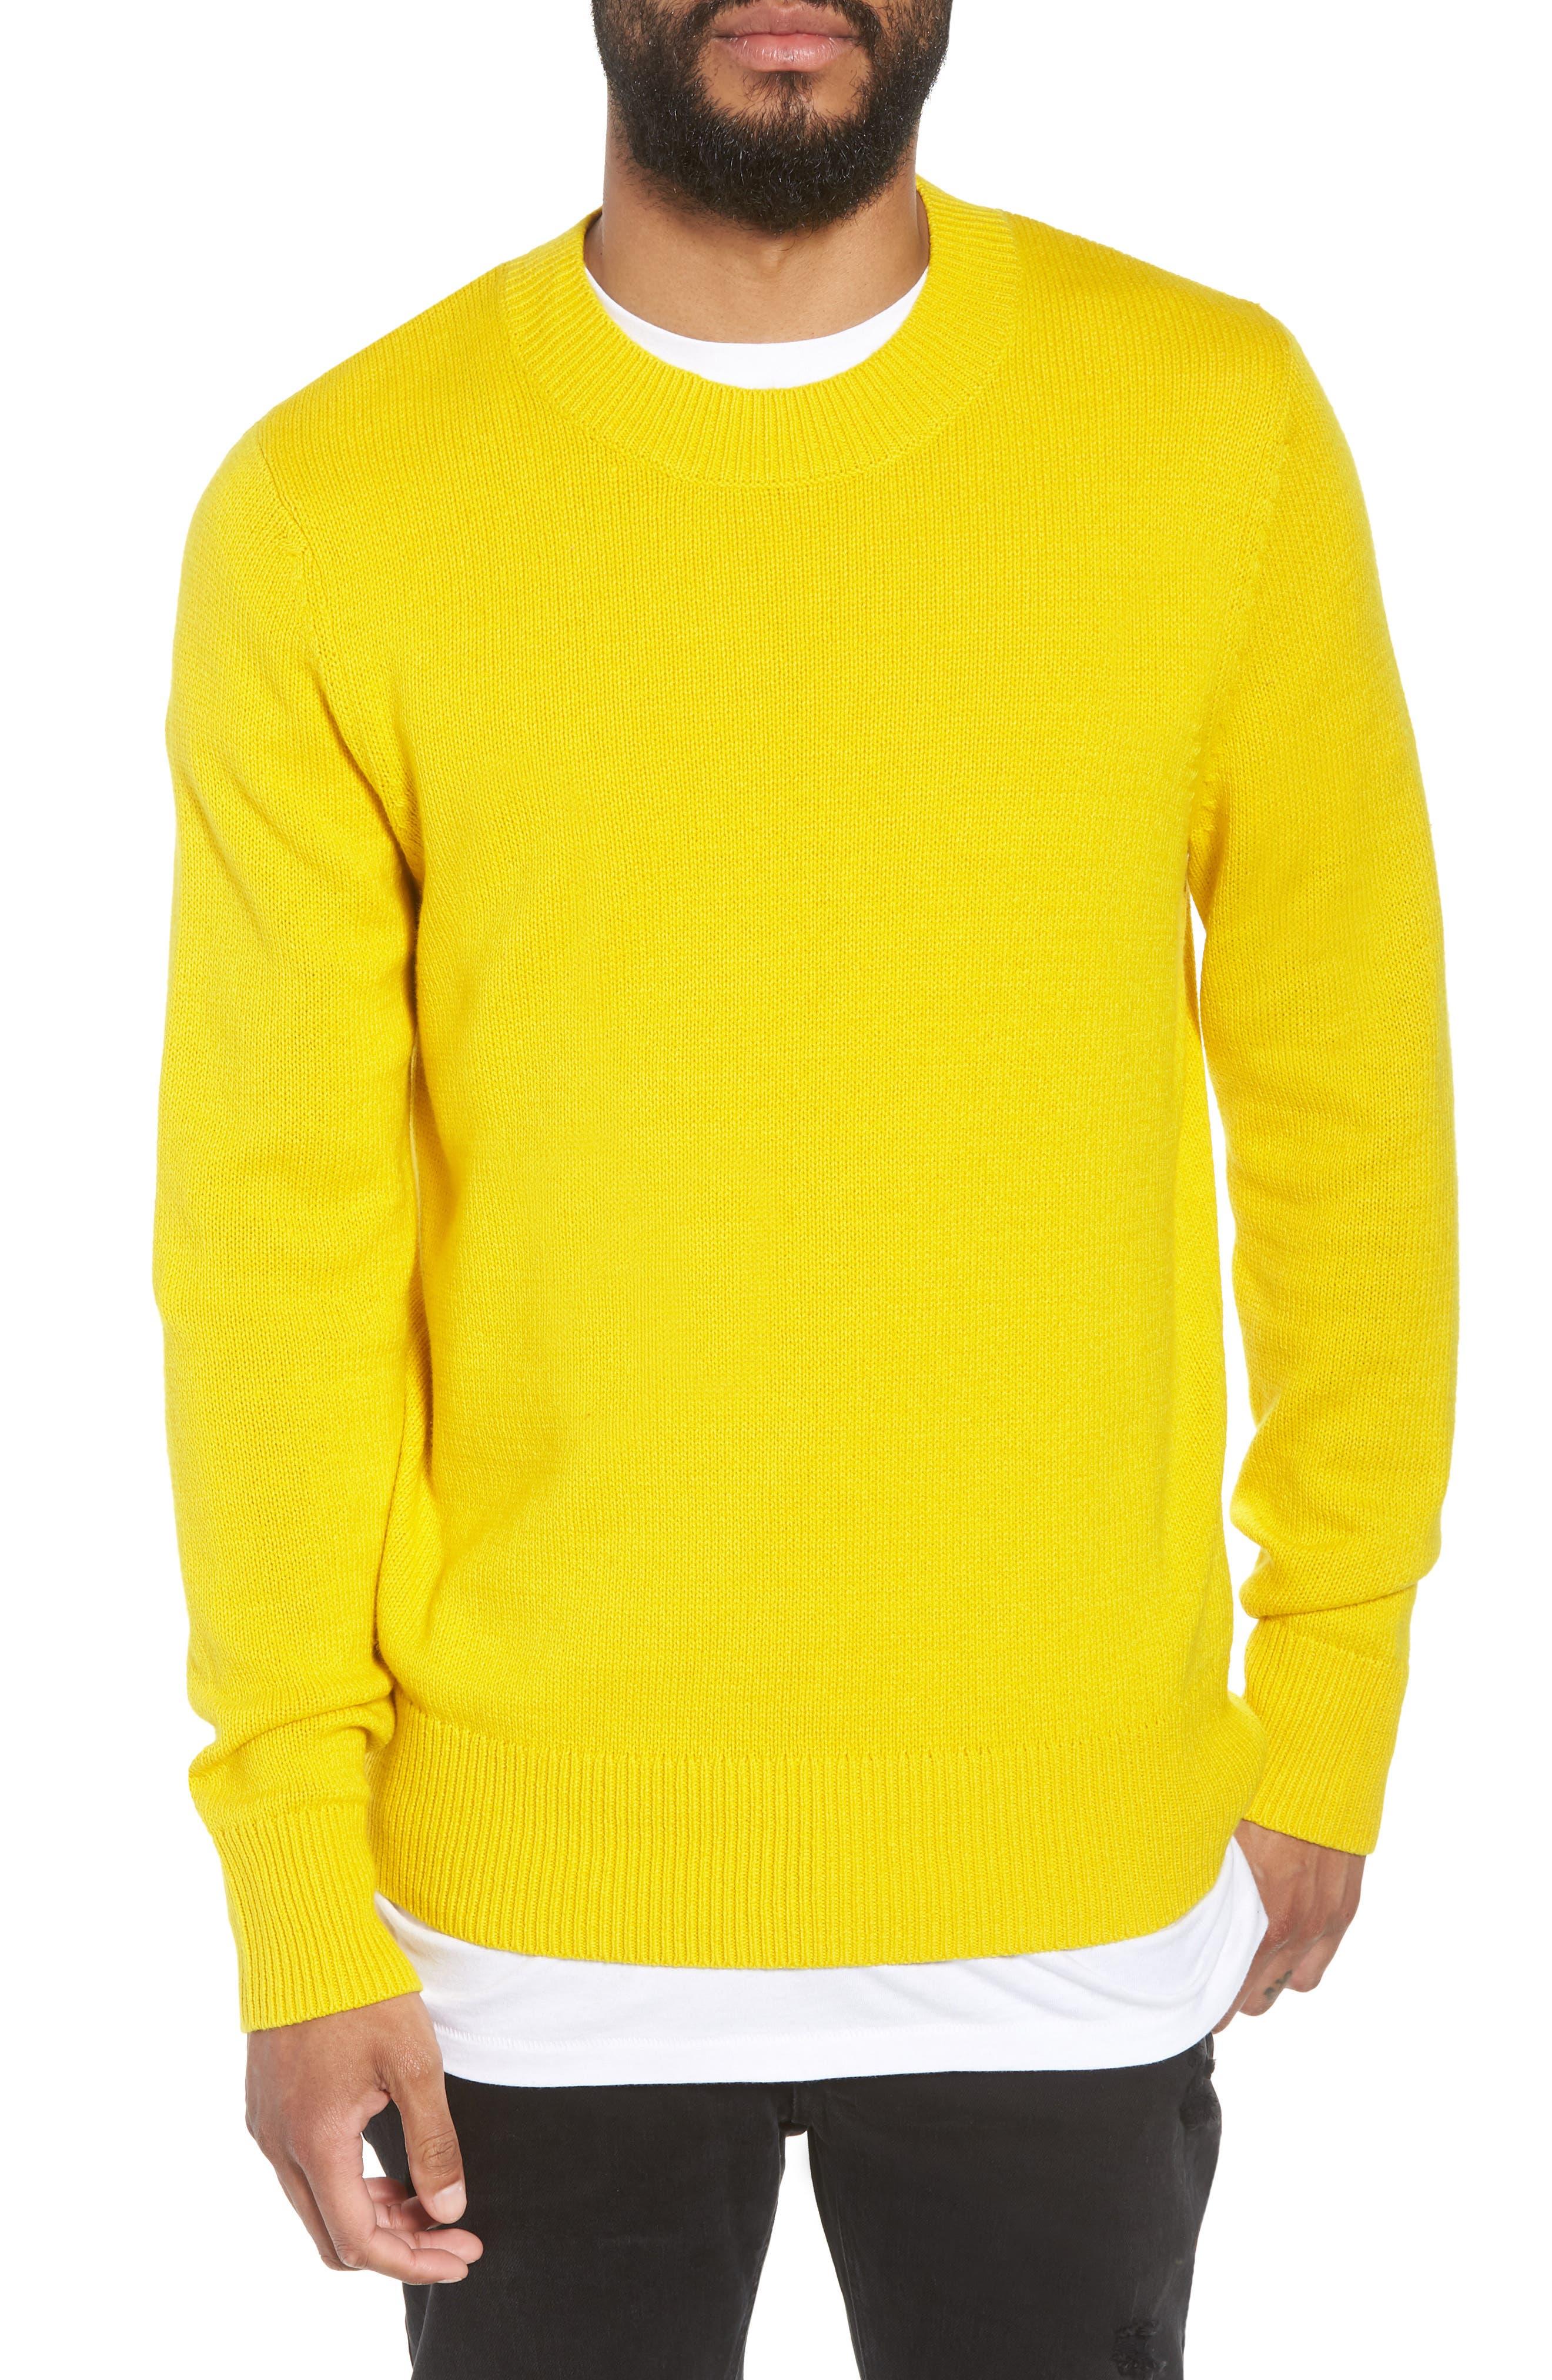 Crewneck Sweater,                         Main,                         color, YELLOW SULPHUR